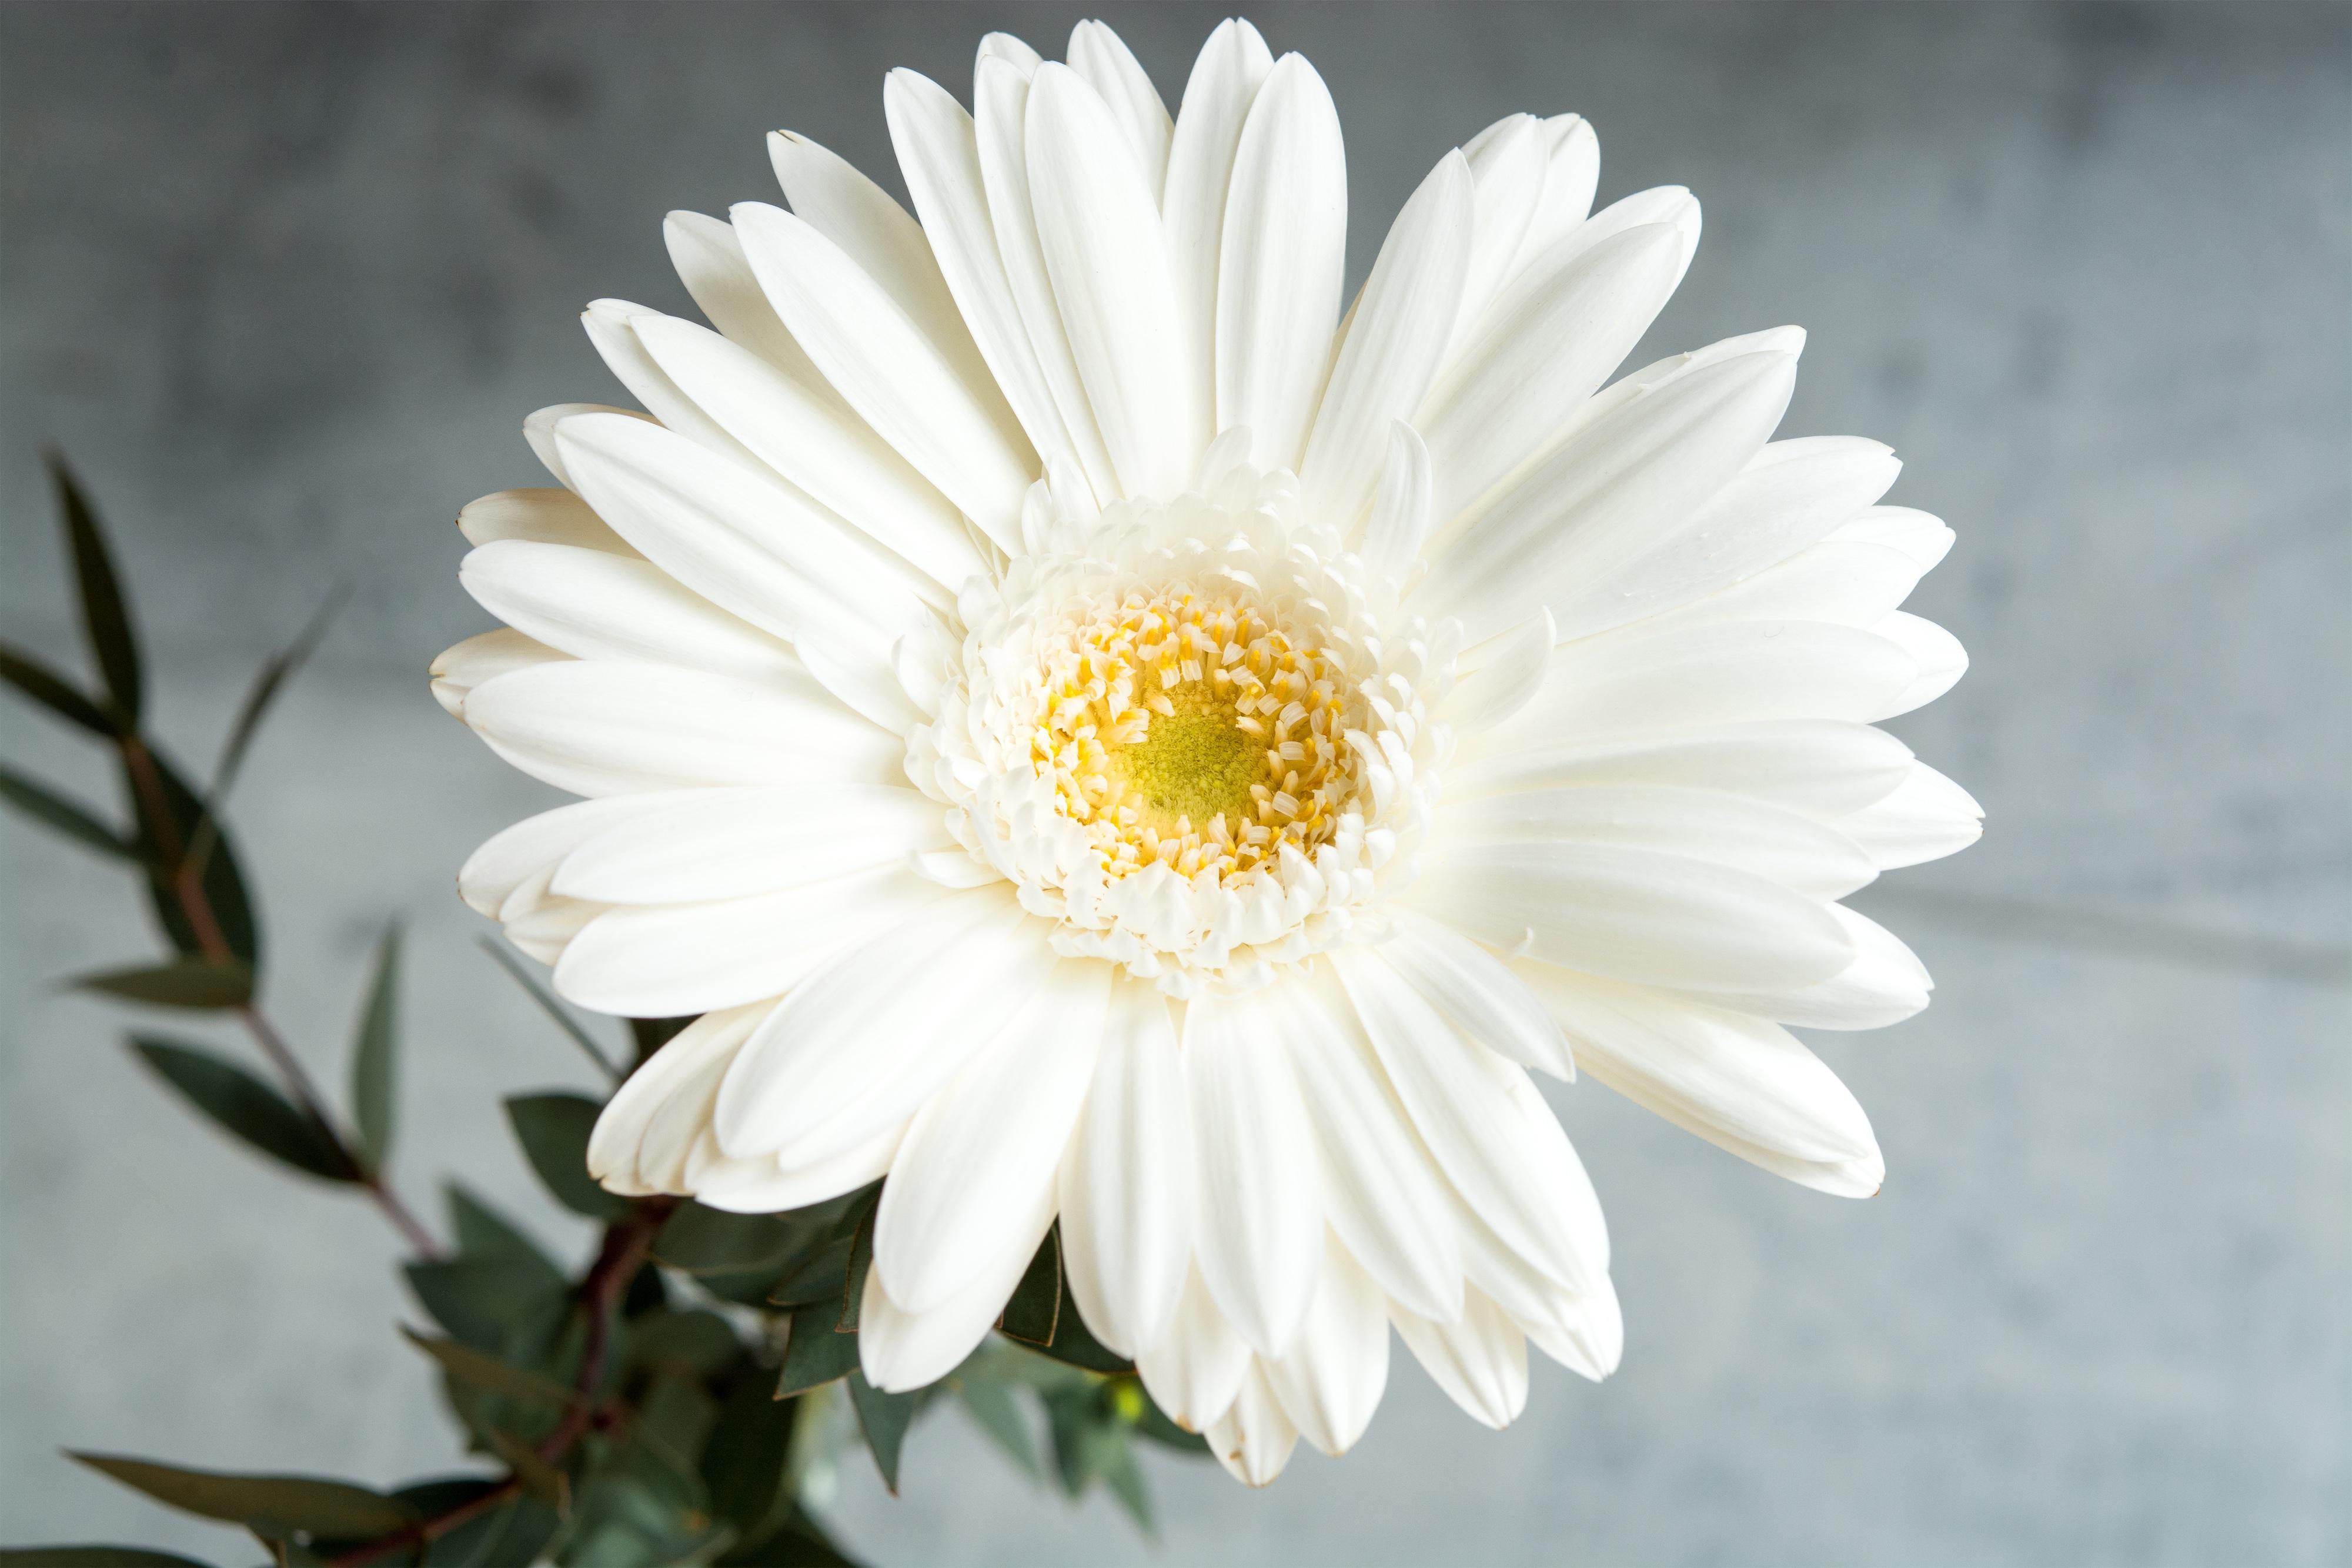 Unduh 55+ Gambar Bunga Putih HD Paling Keren